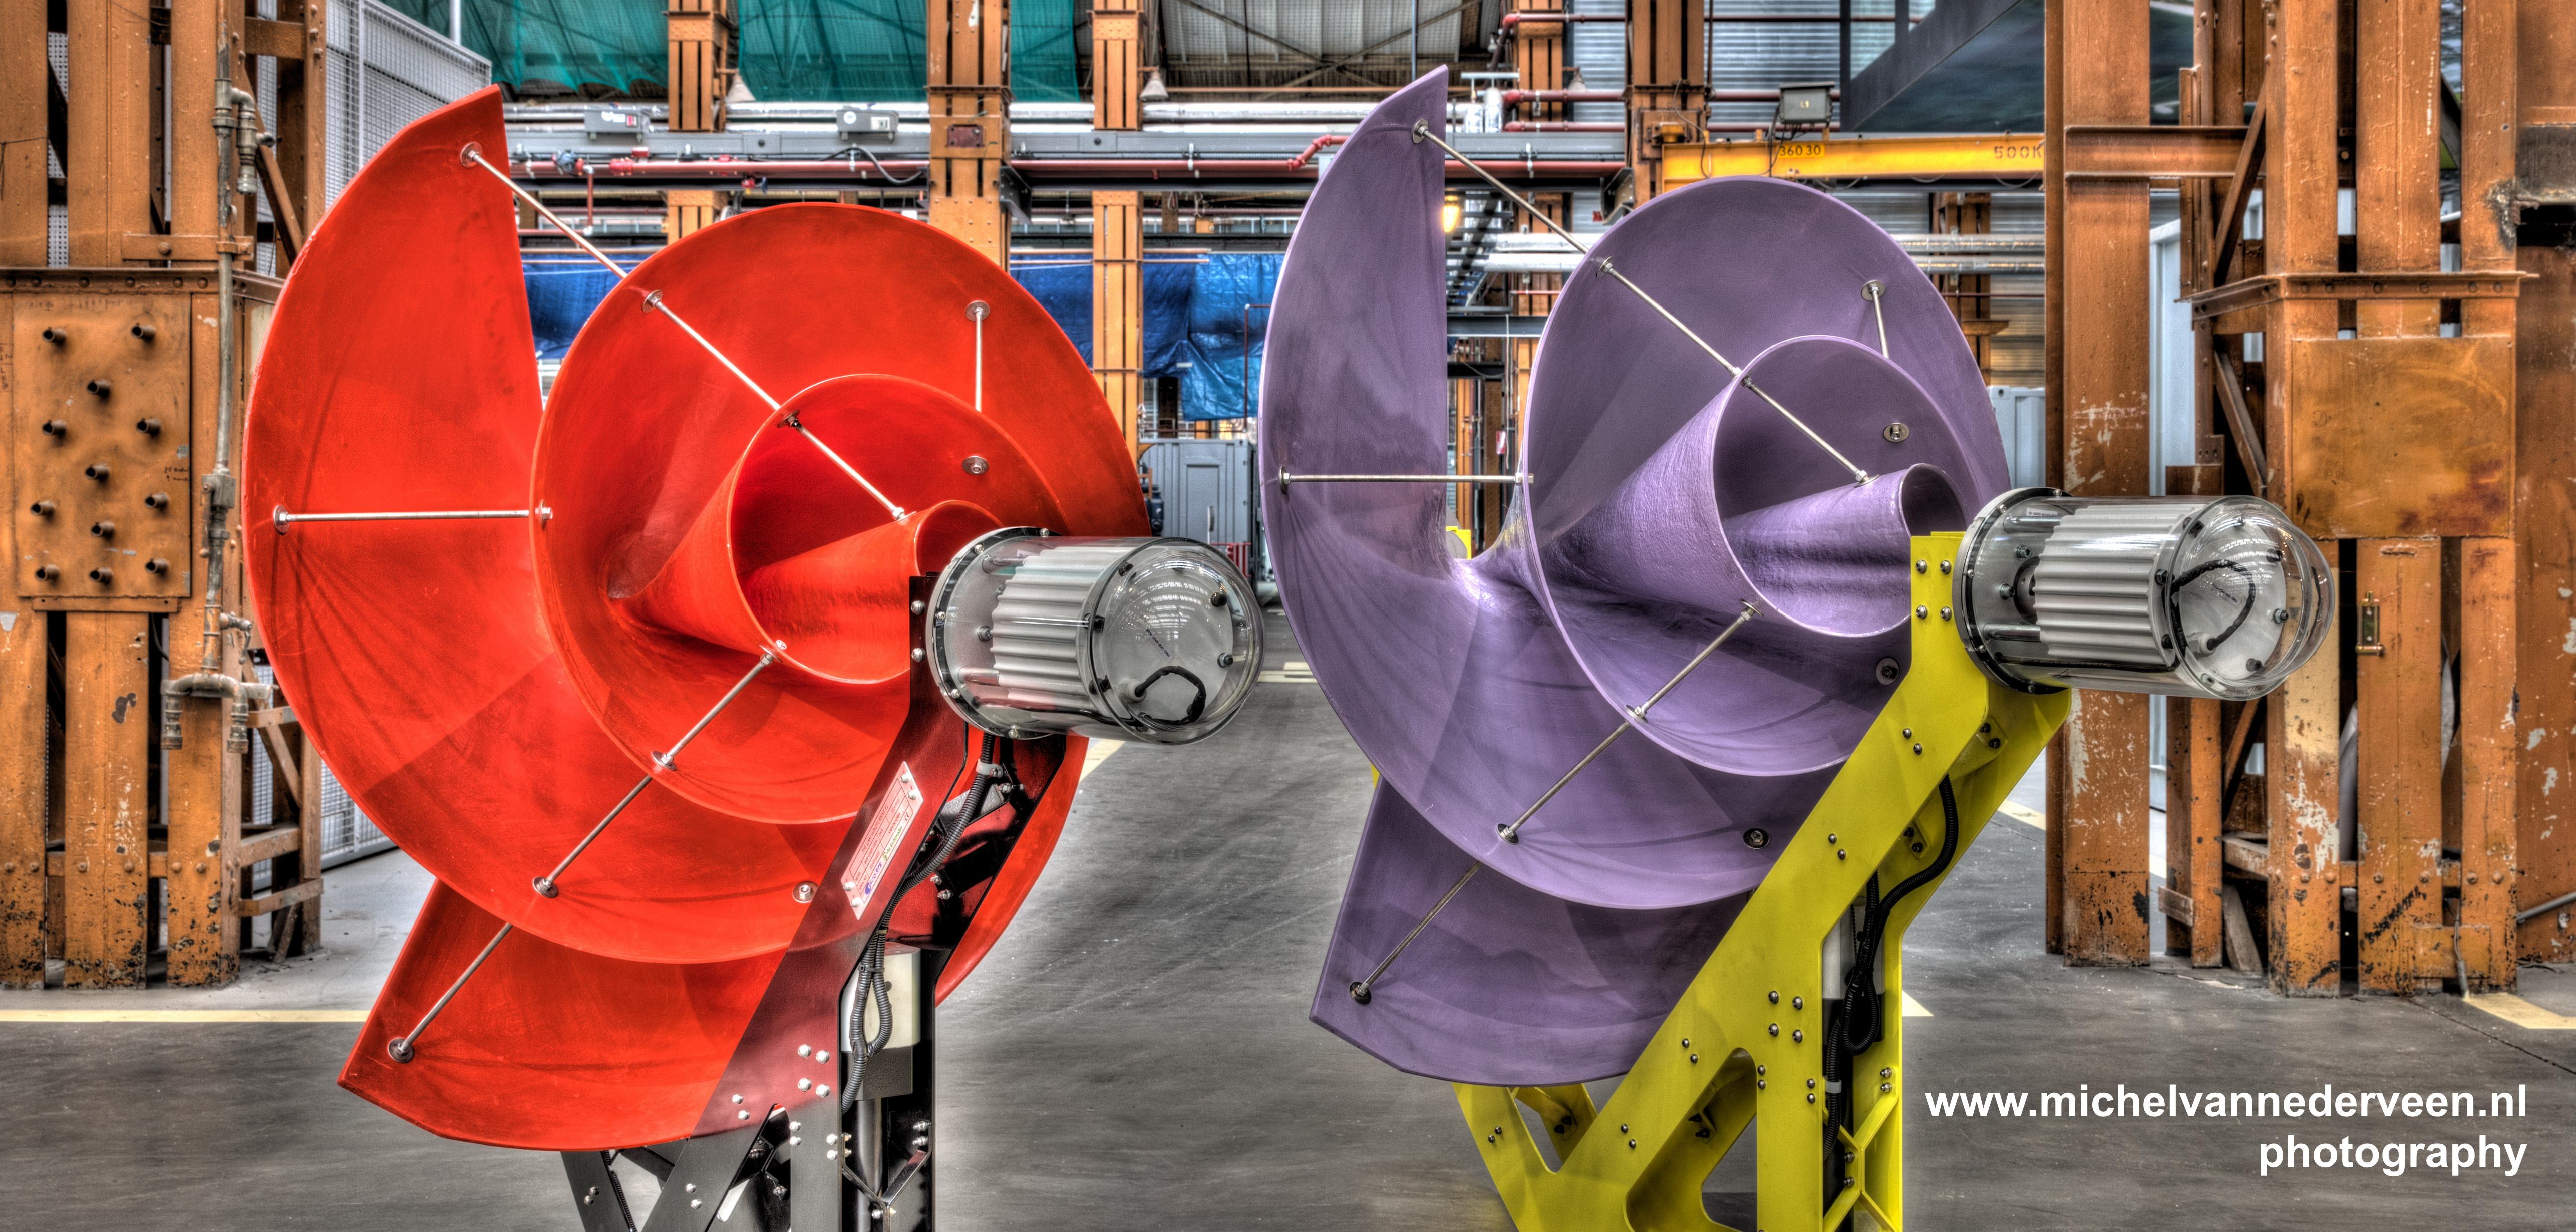 Dutch firm launches 'virtually soundless' domestic wind ... Liam F1 Urban Wind Turbine